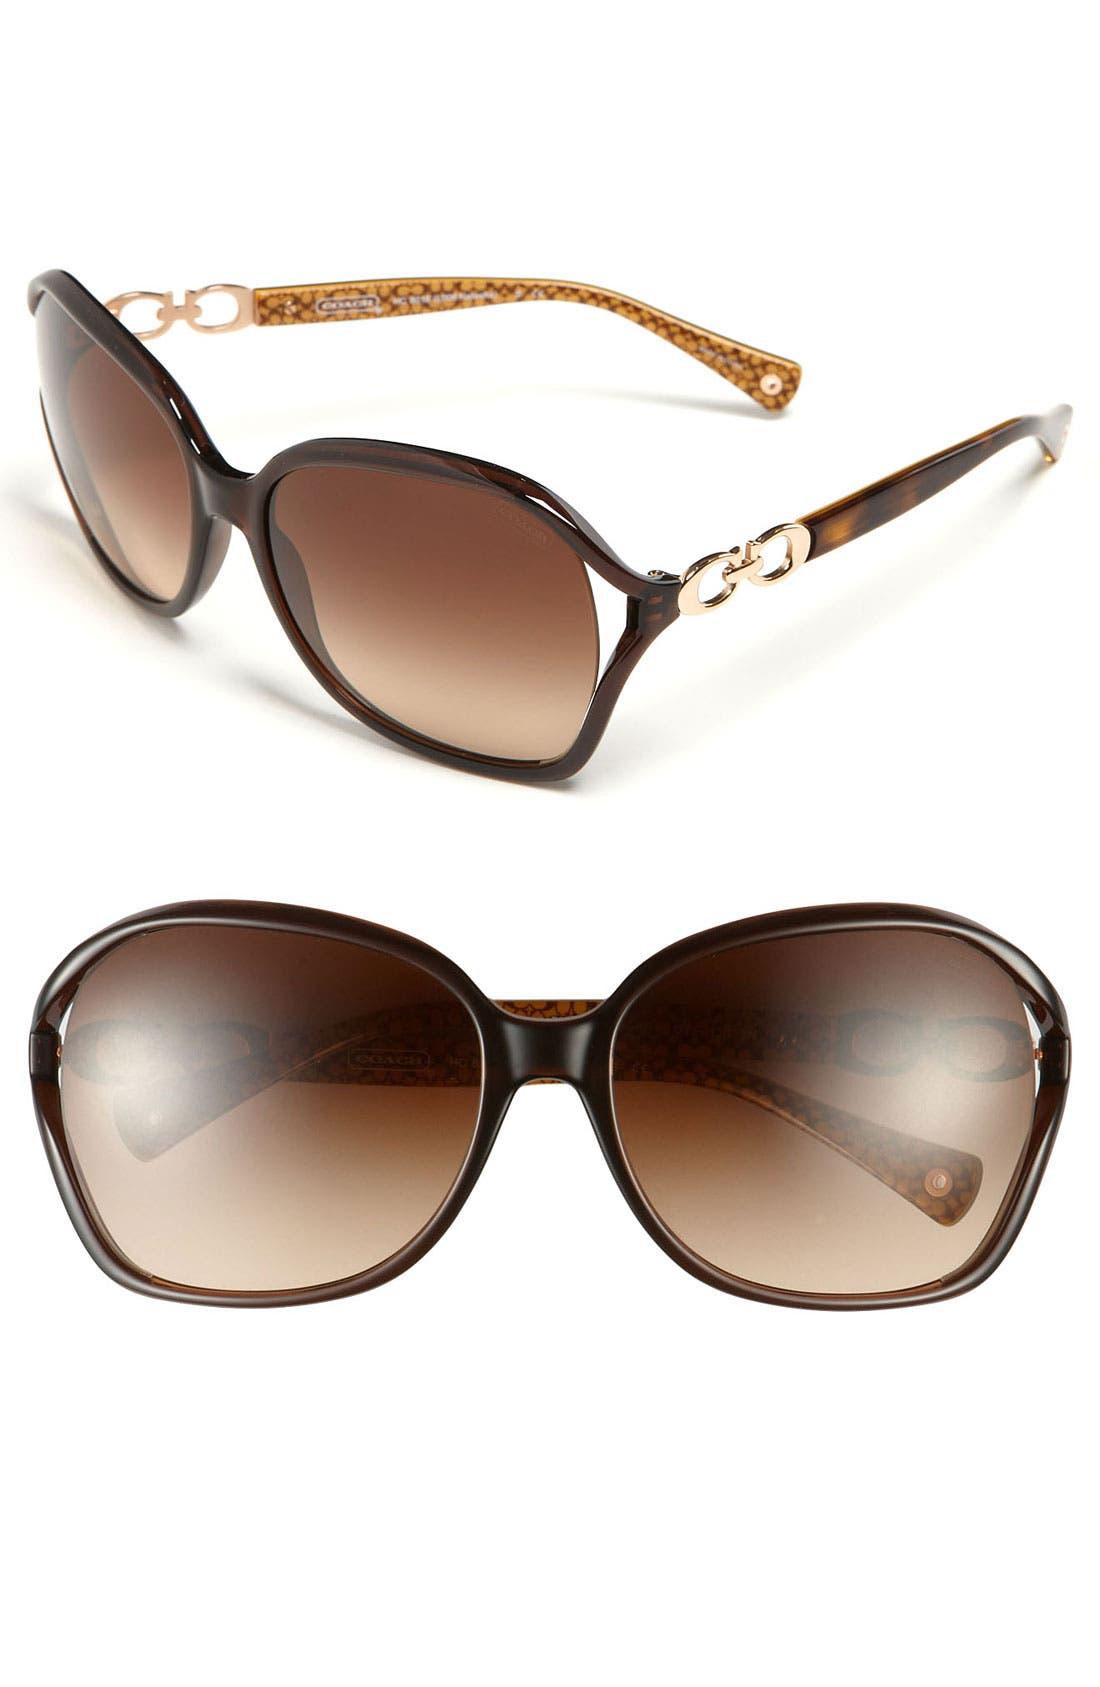 Main Image - COACH Oversized Sunglasses